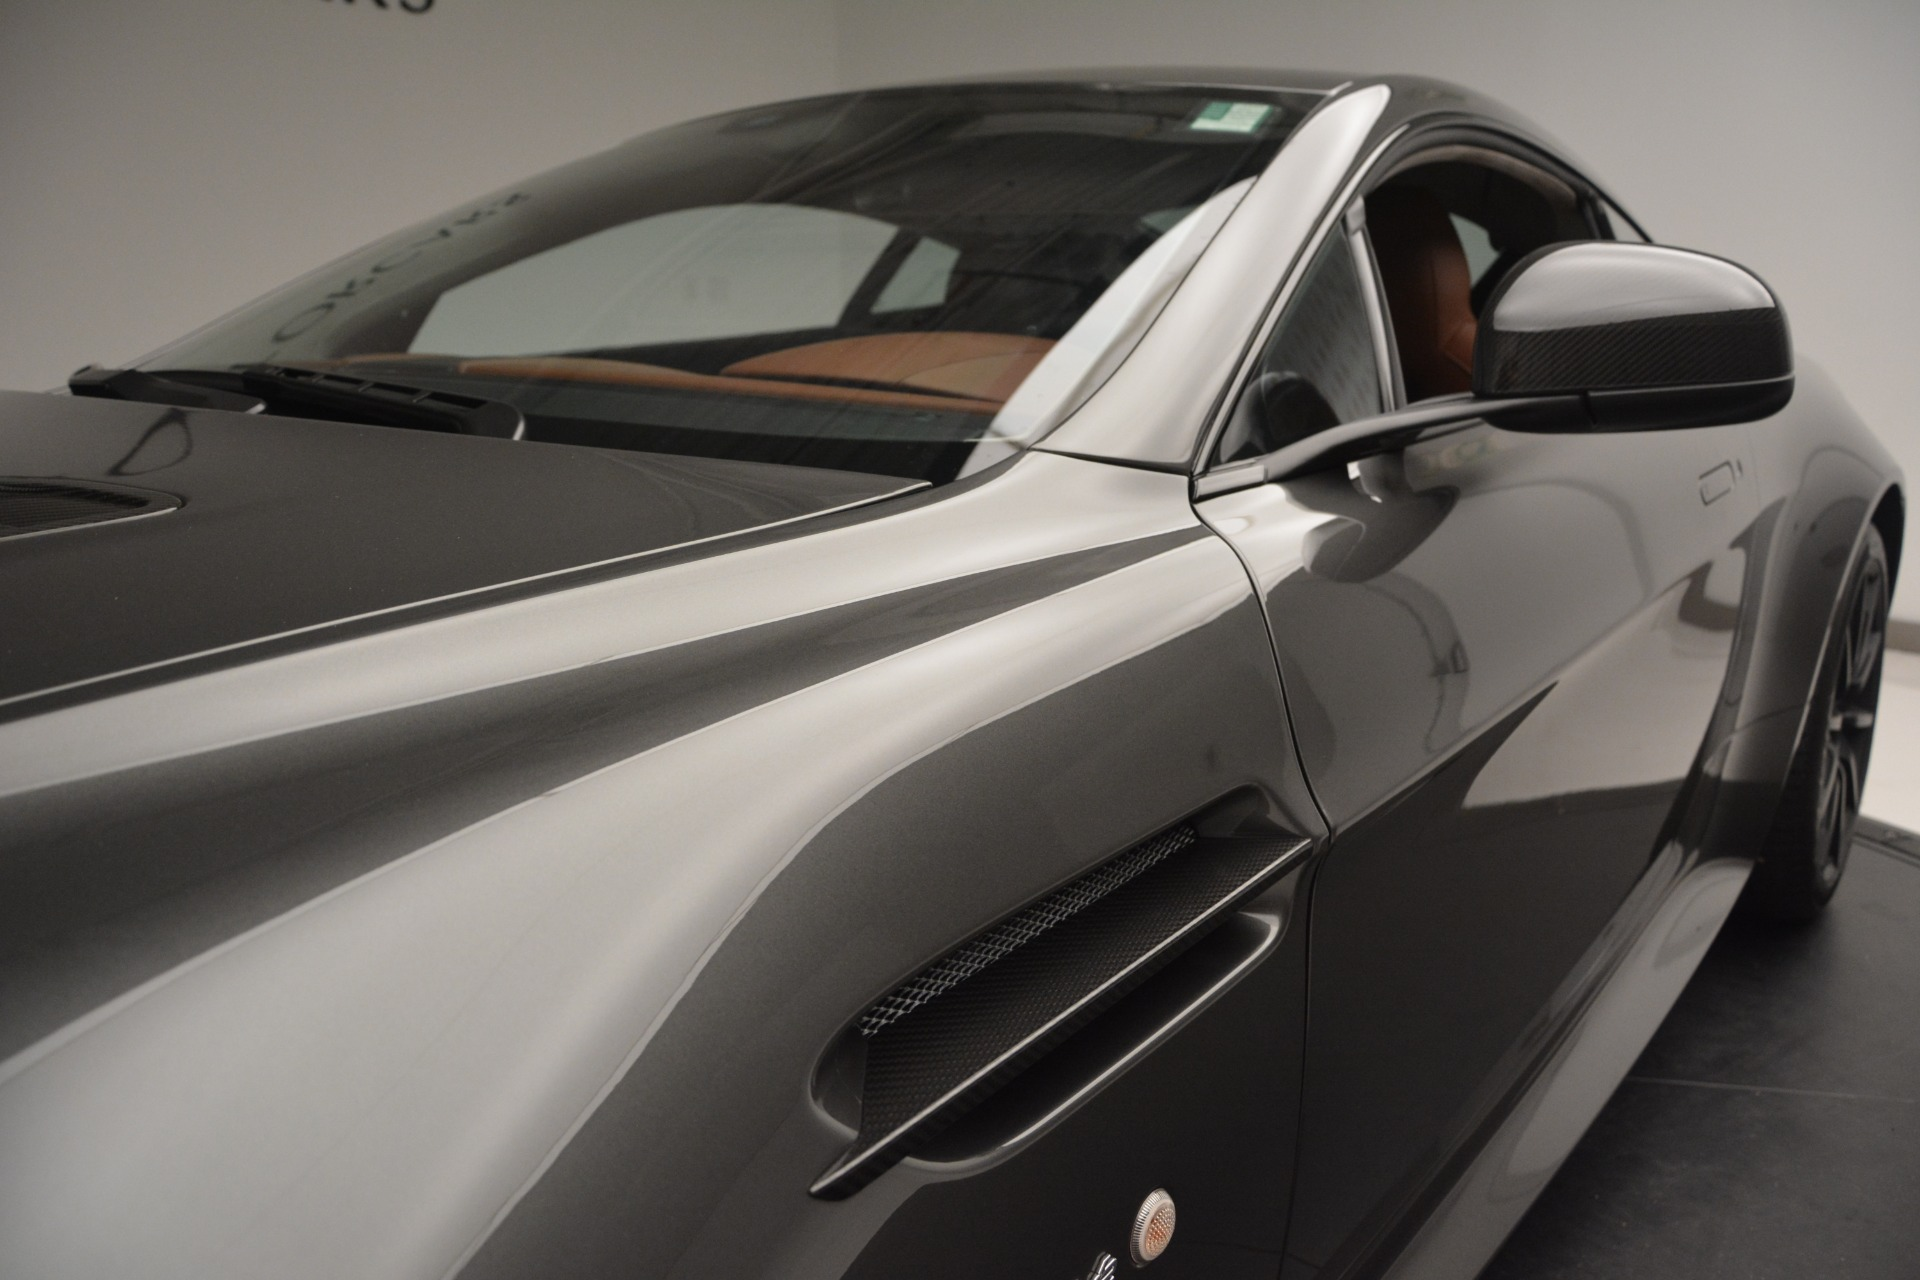 Used 2017 Aston Martin V12 Vantage S  For Sale In Westport, CT 2561_p13